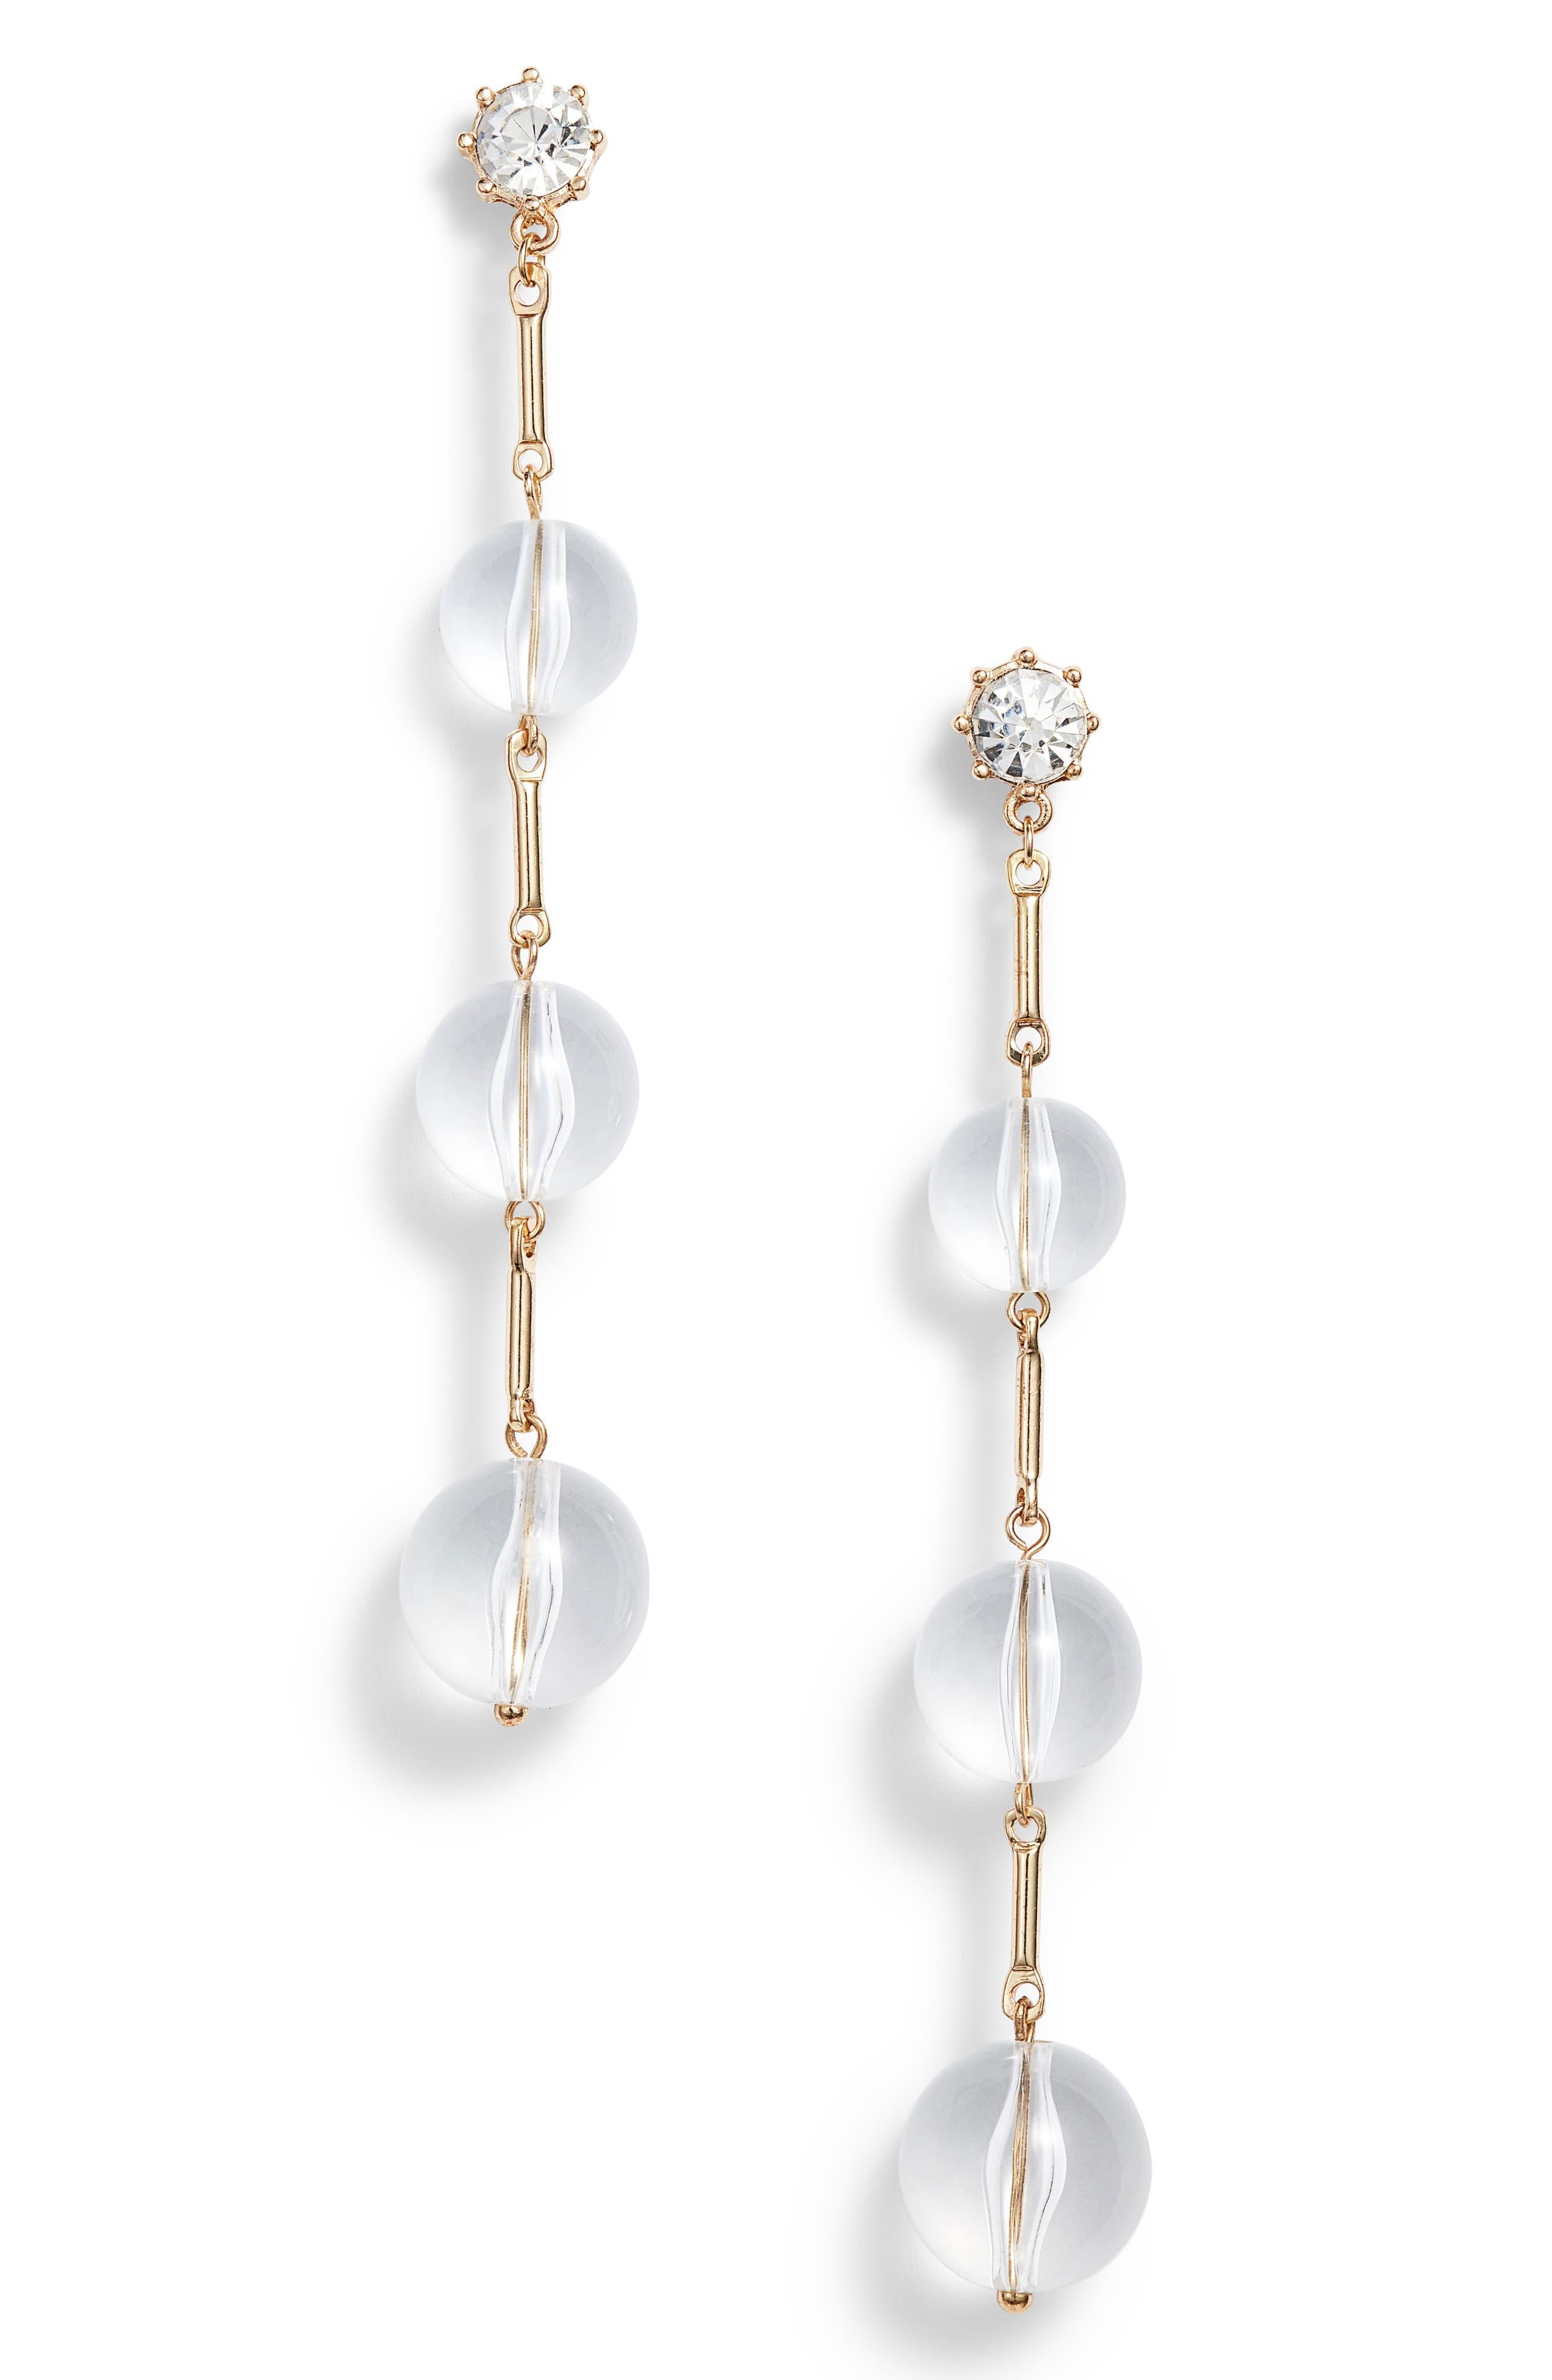 Clear Bead Drop Earrings,                             Main thumbnail 1, color,                             Gold/ Clear